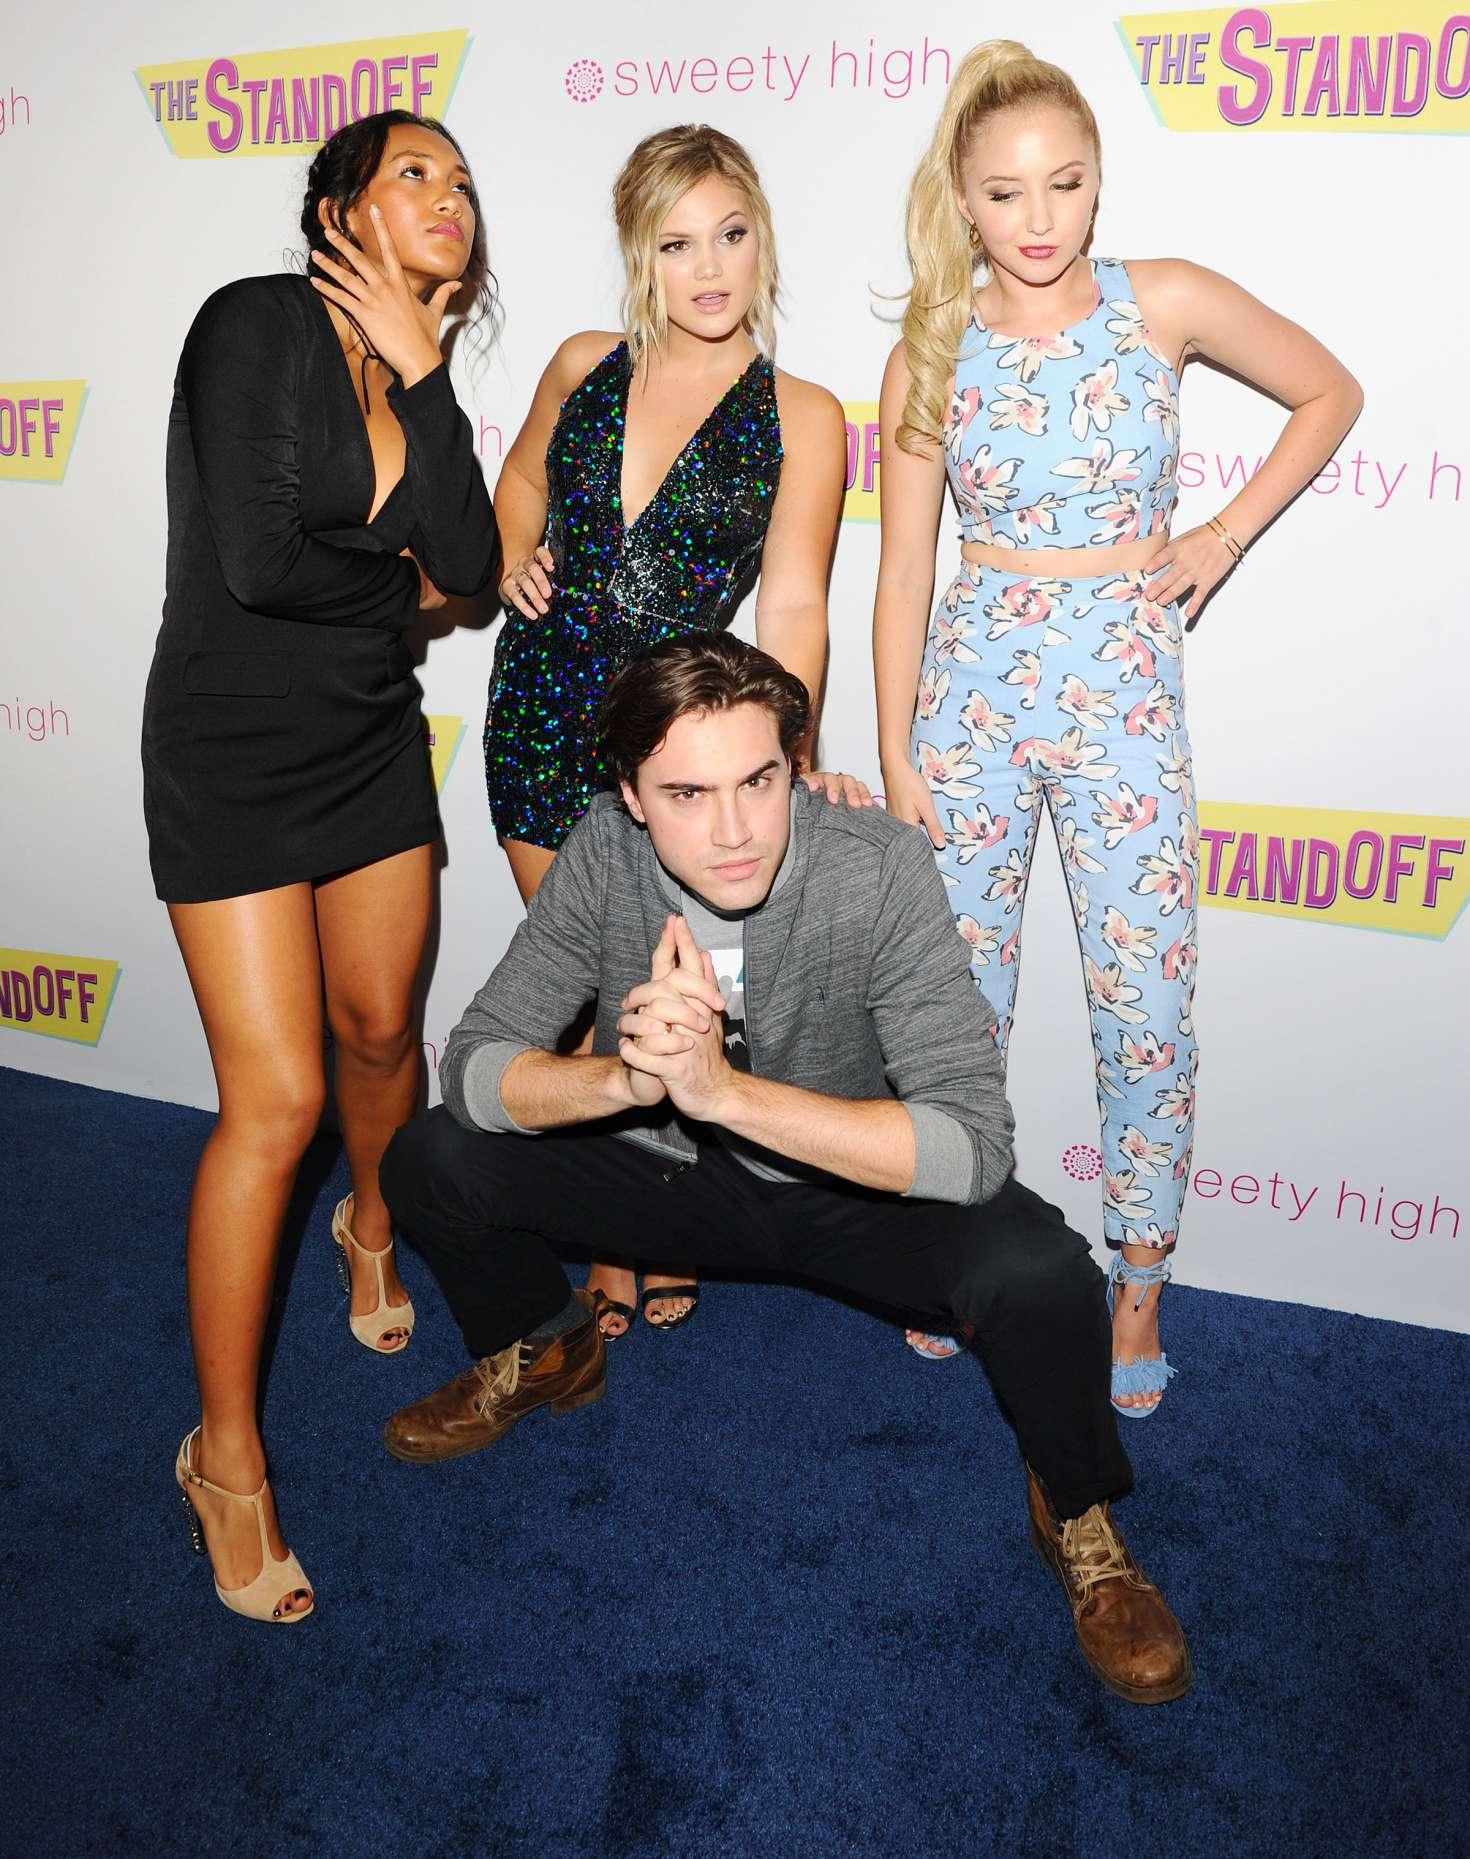 Olivia Holt 2016 : Olivia Holt: The Standoff LA Premiere -31